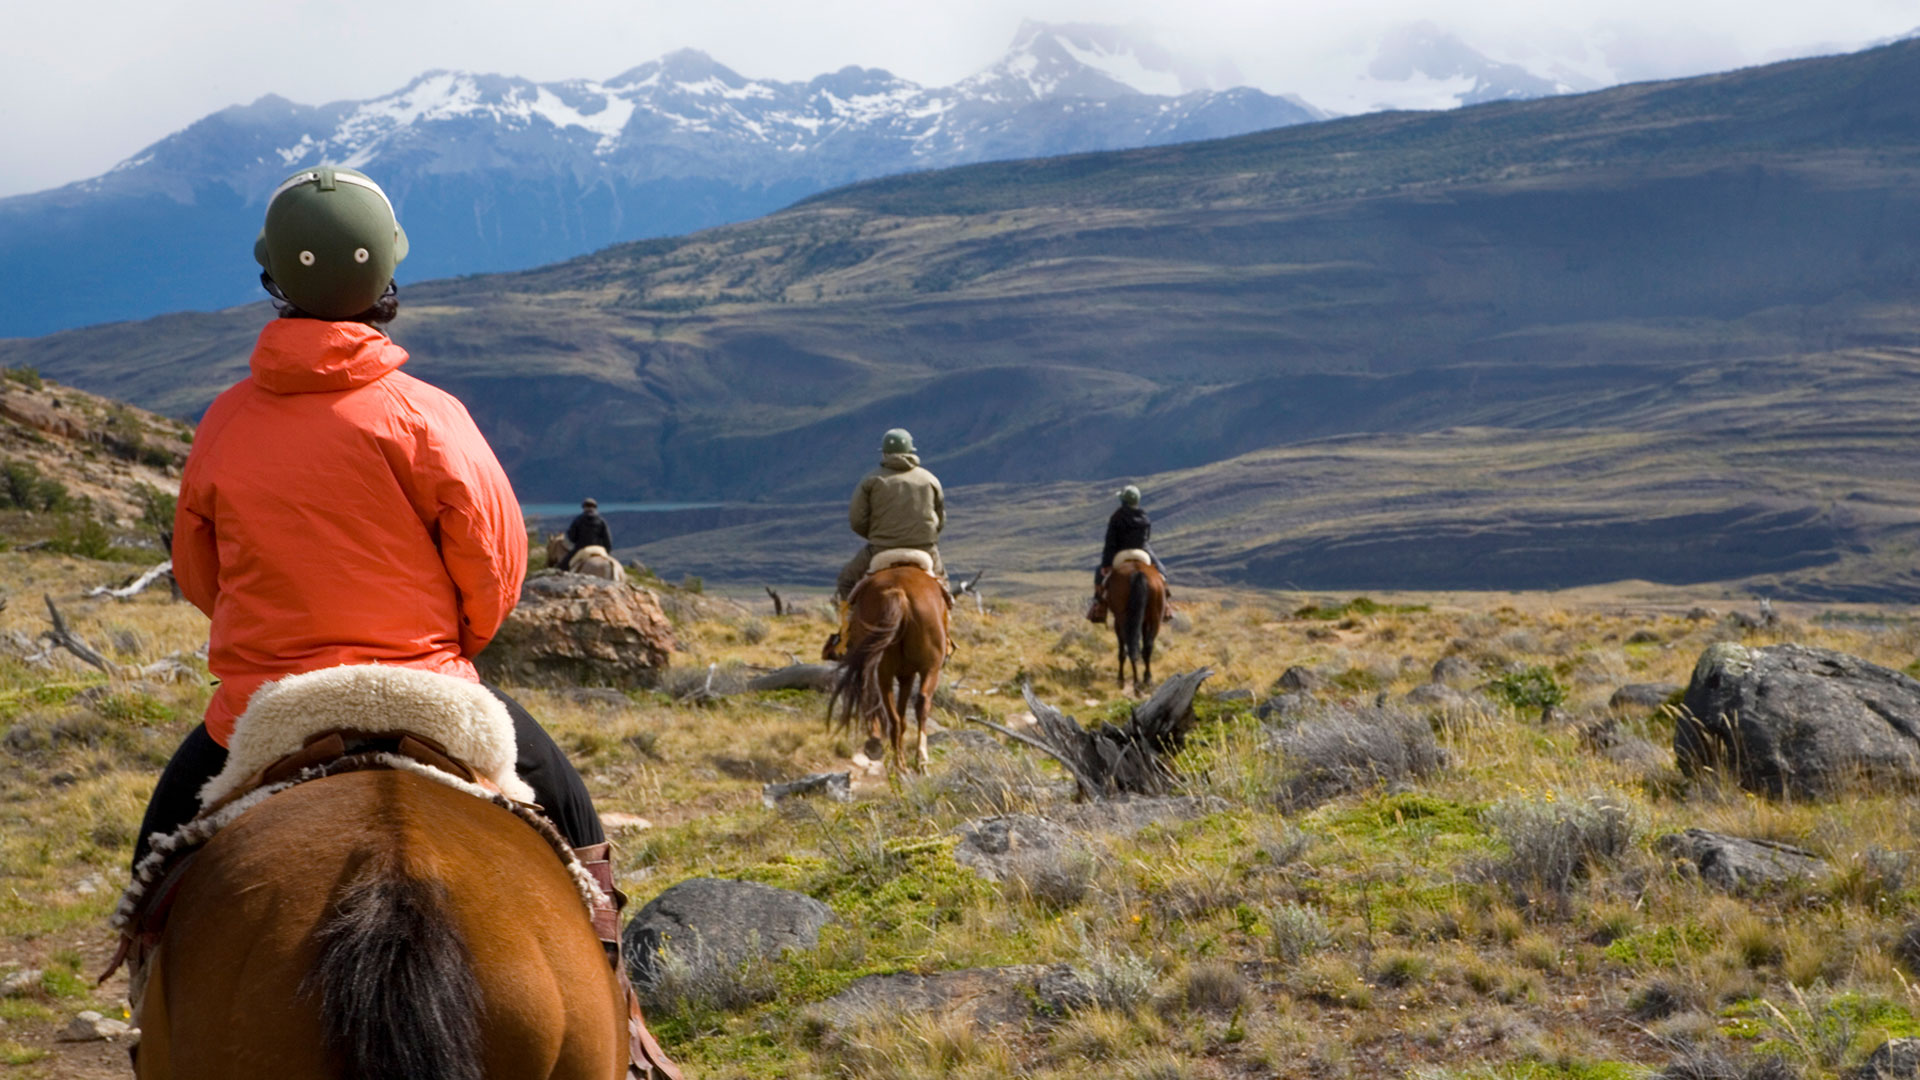 Horseback riding near Estancia Cristina, Argentina